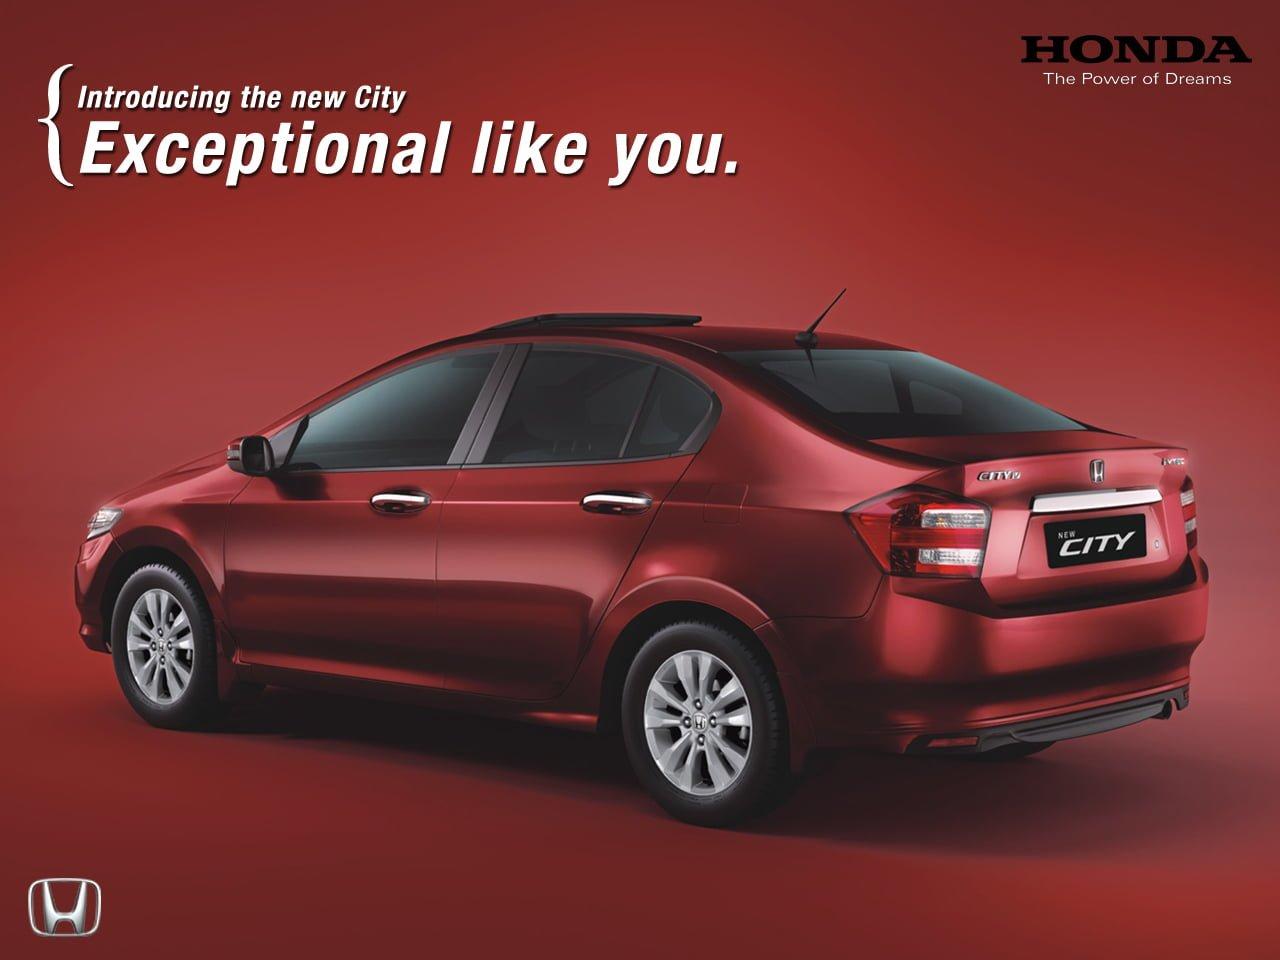 New Honda City View 2